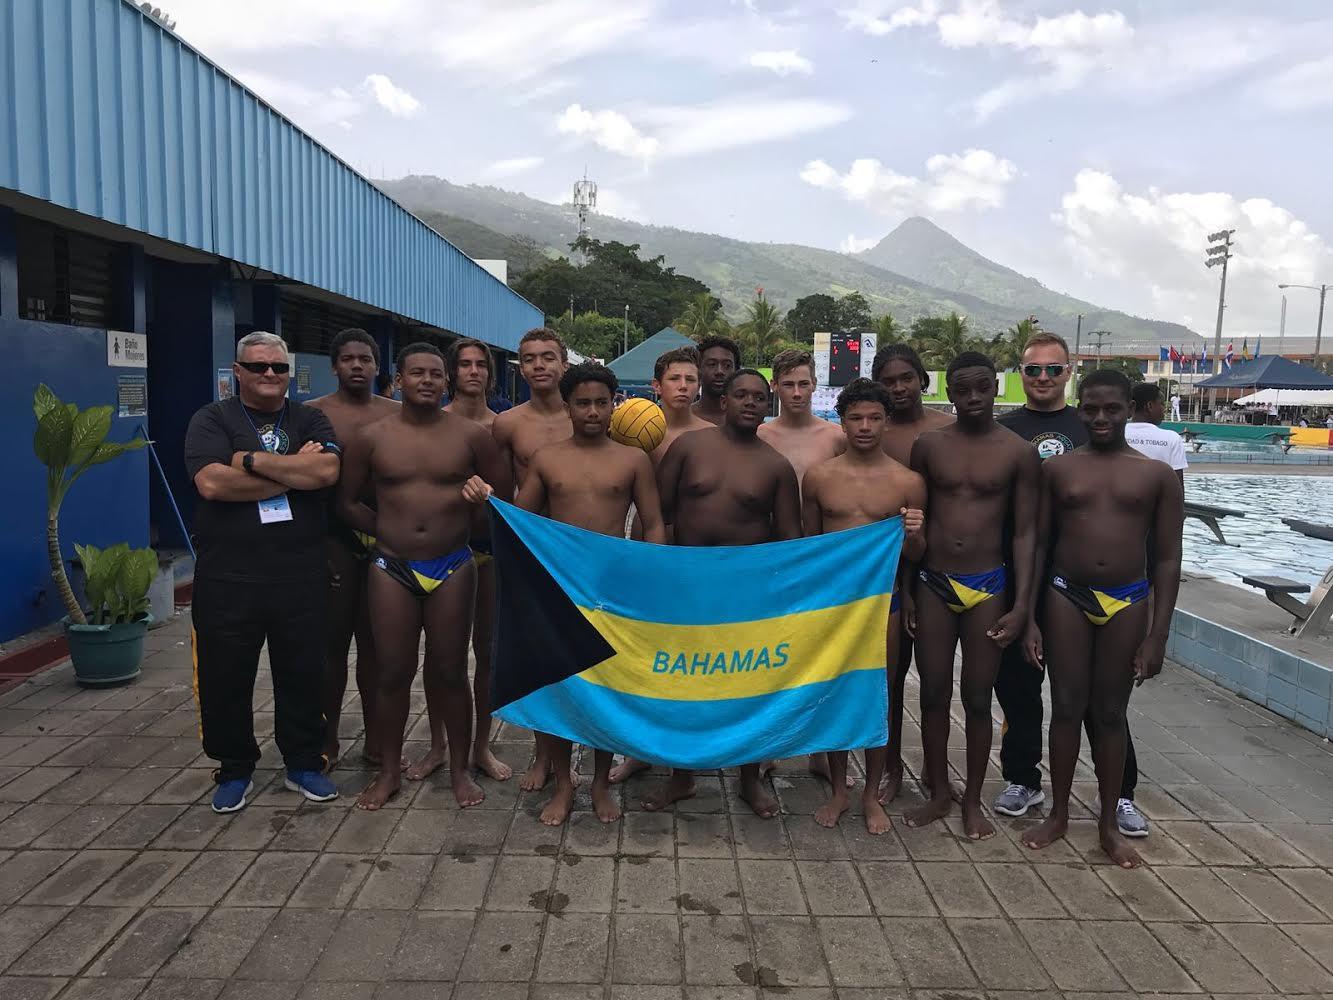 The Bahamas knocks off Trinidad and Tobago 13-11